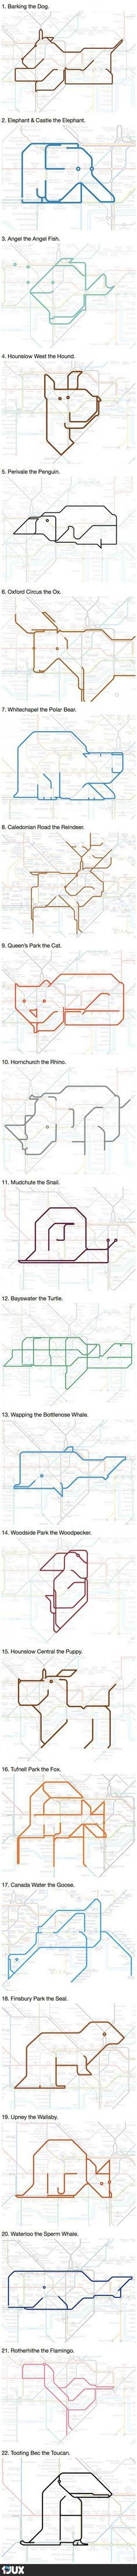 Animals in the London Underground Map